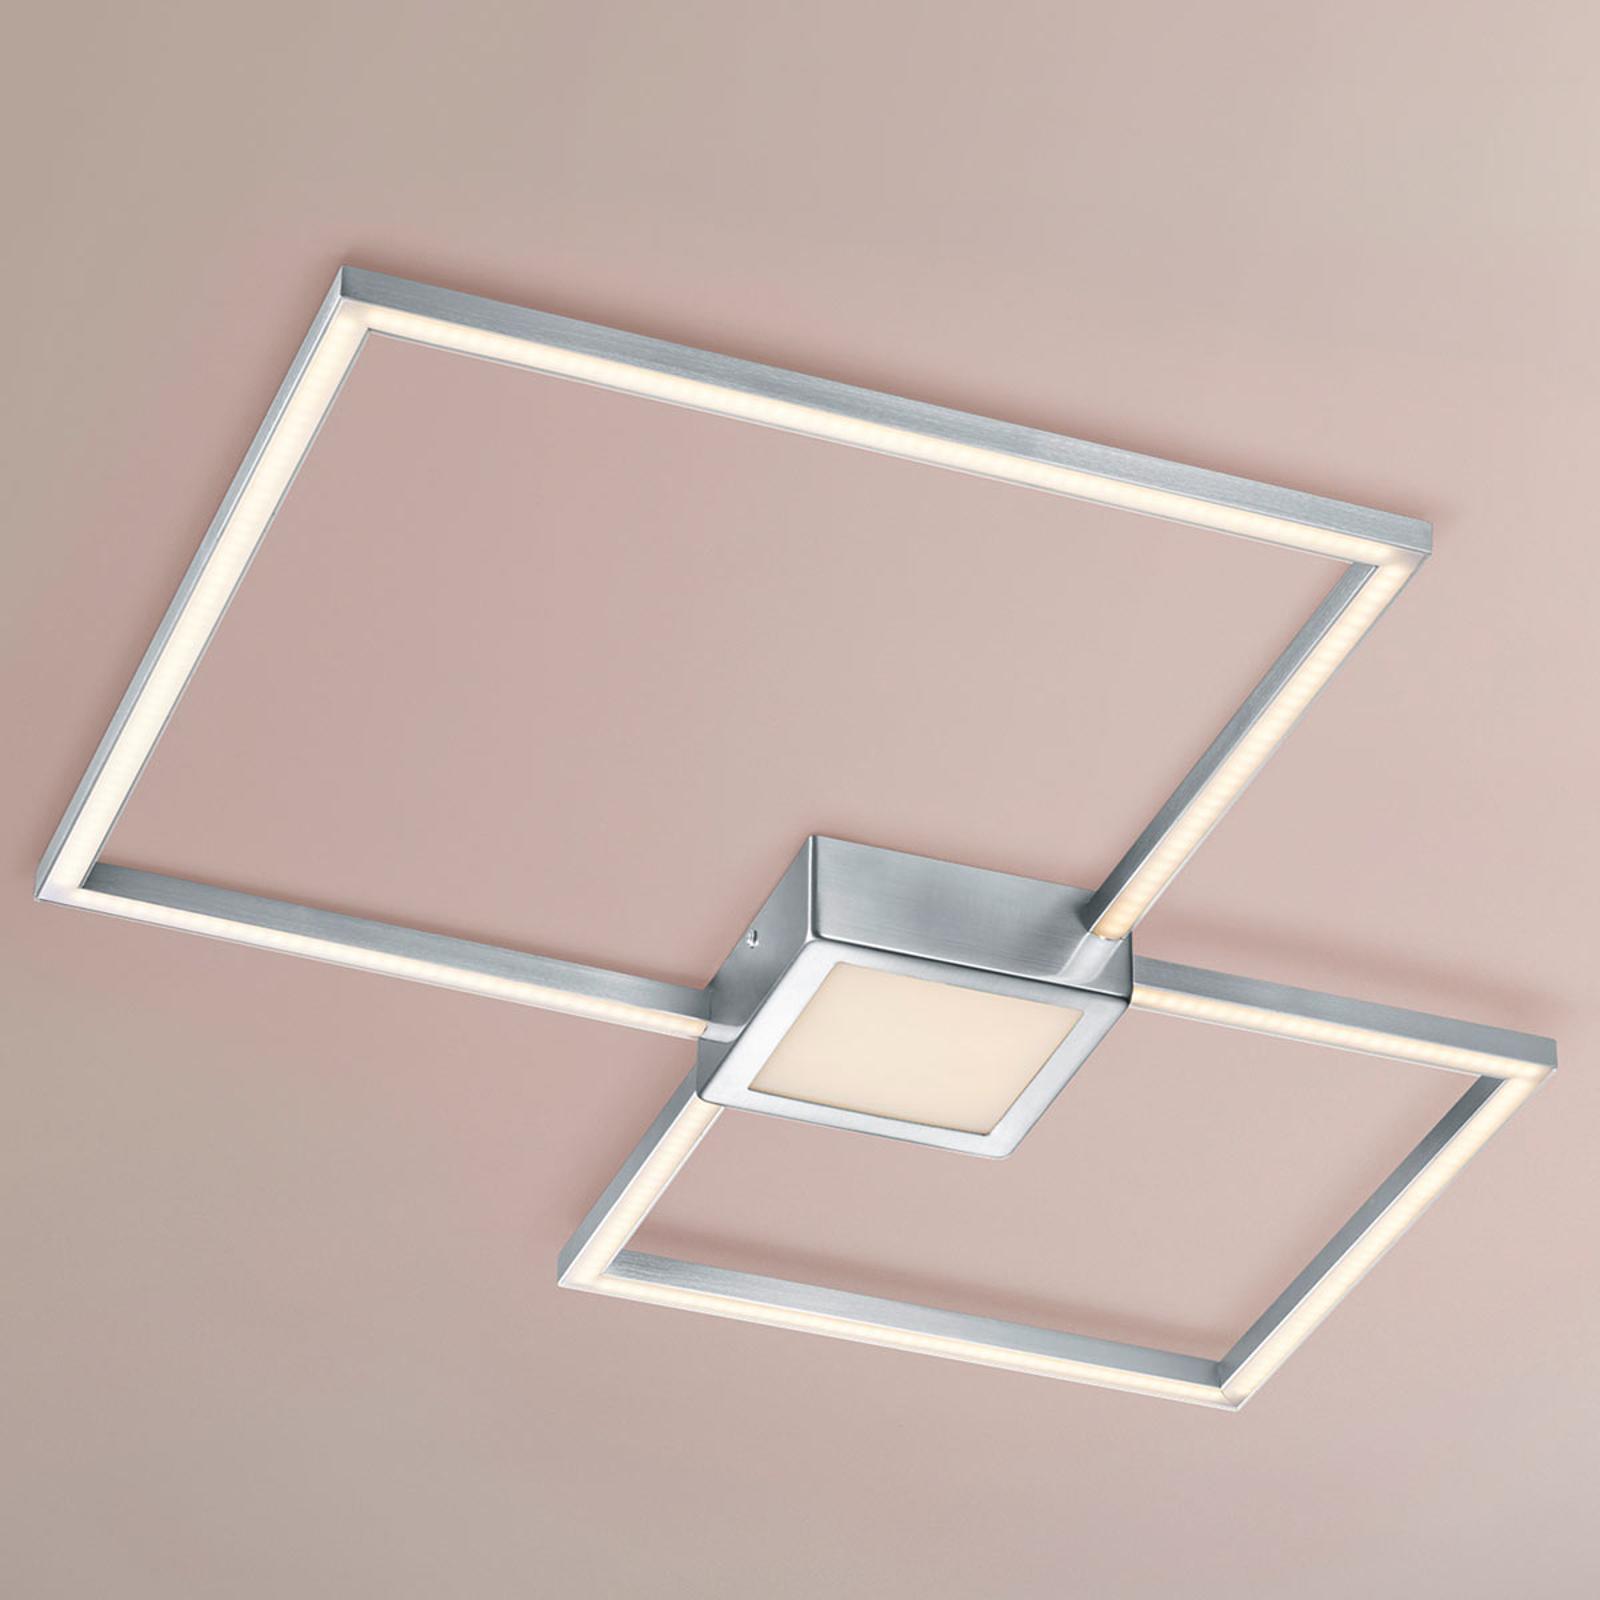 LED plafondlamp Hydra - dimbaar via wandschakelaar